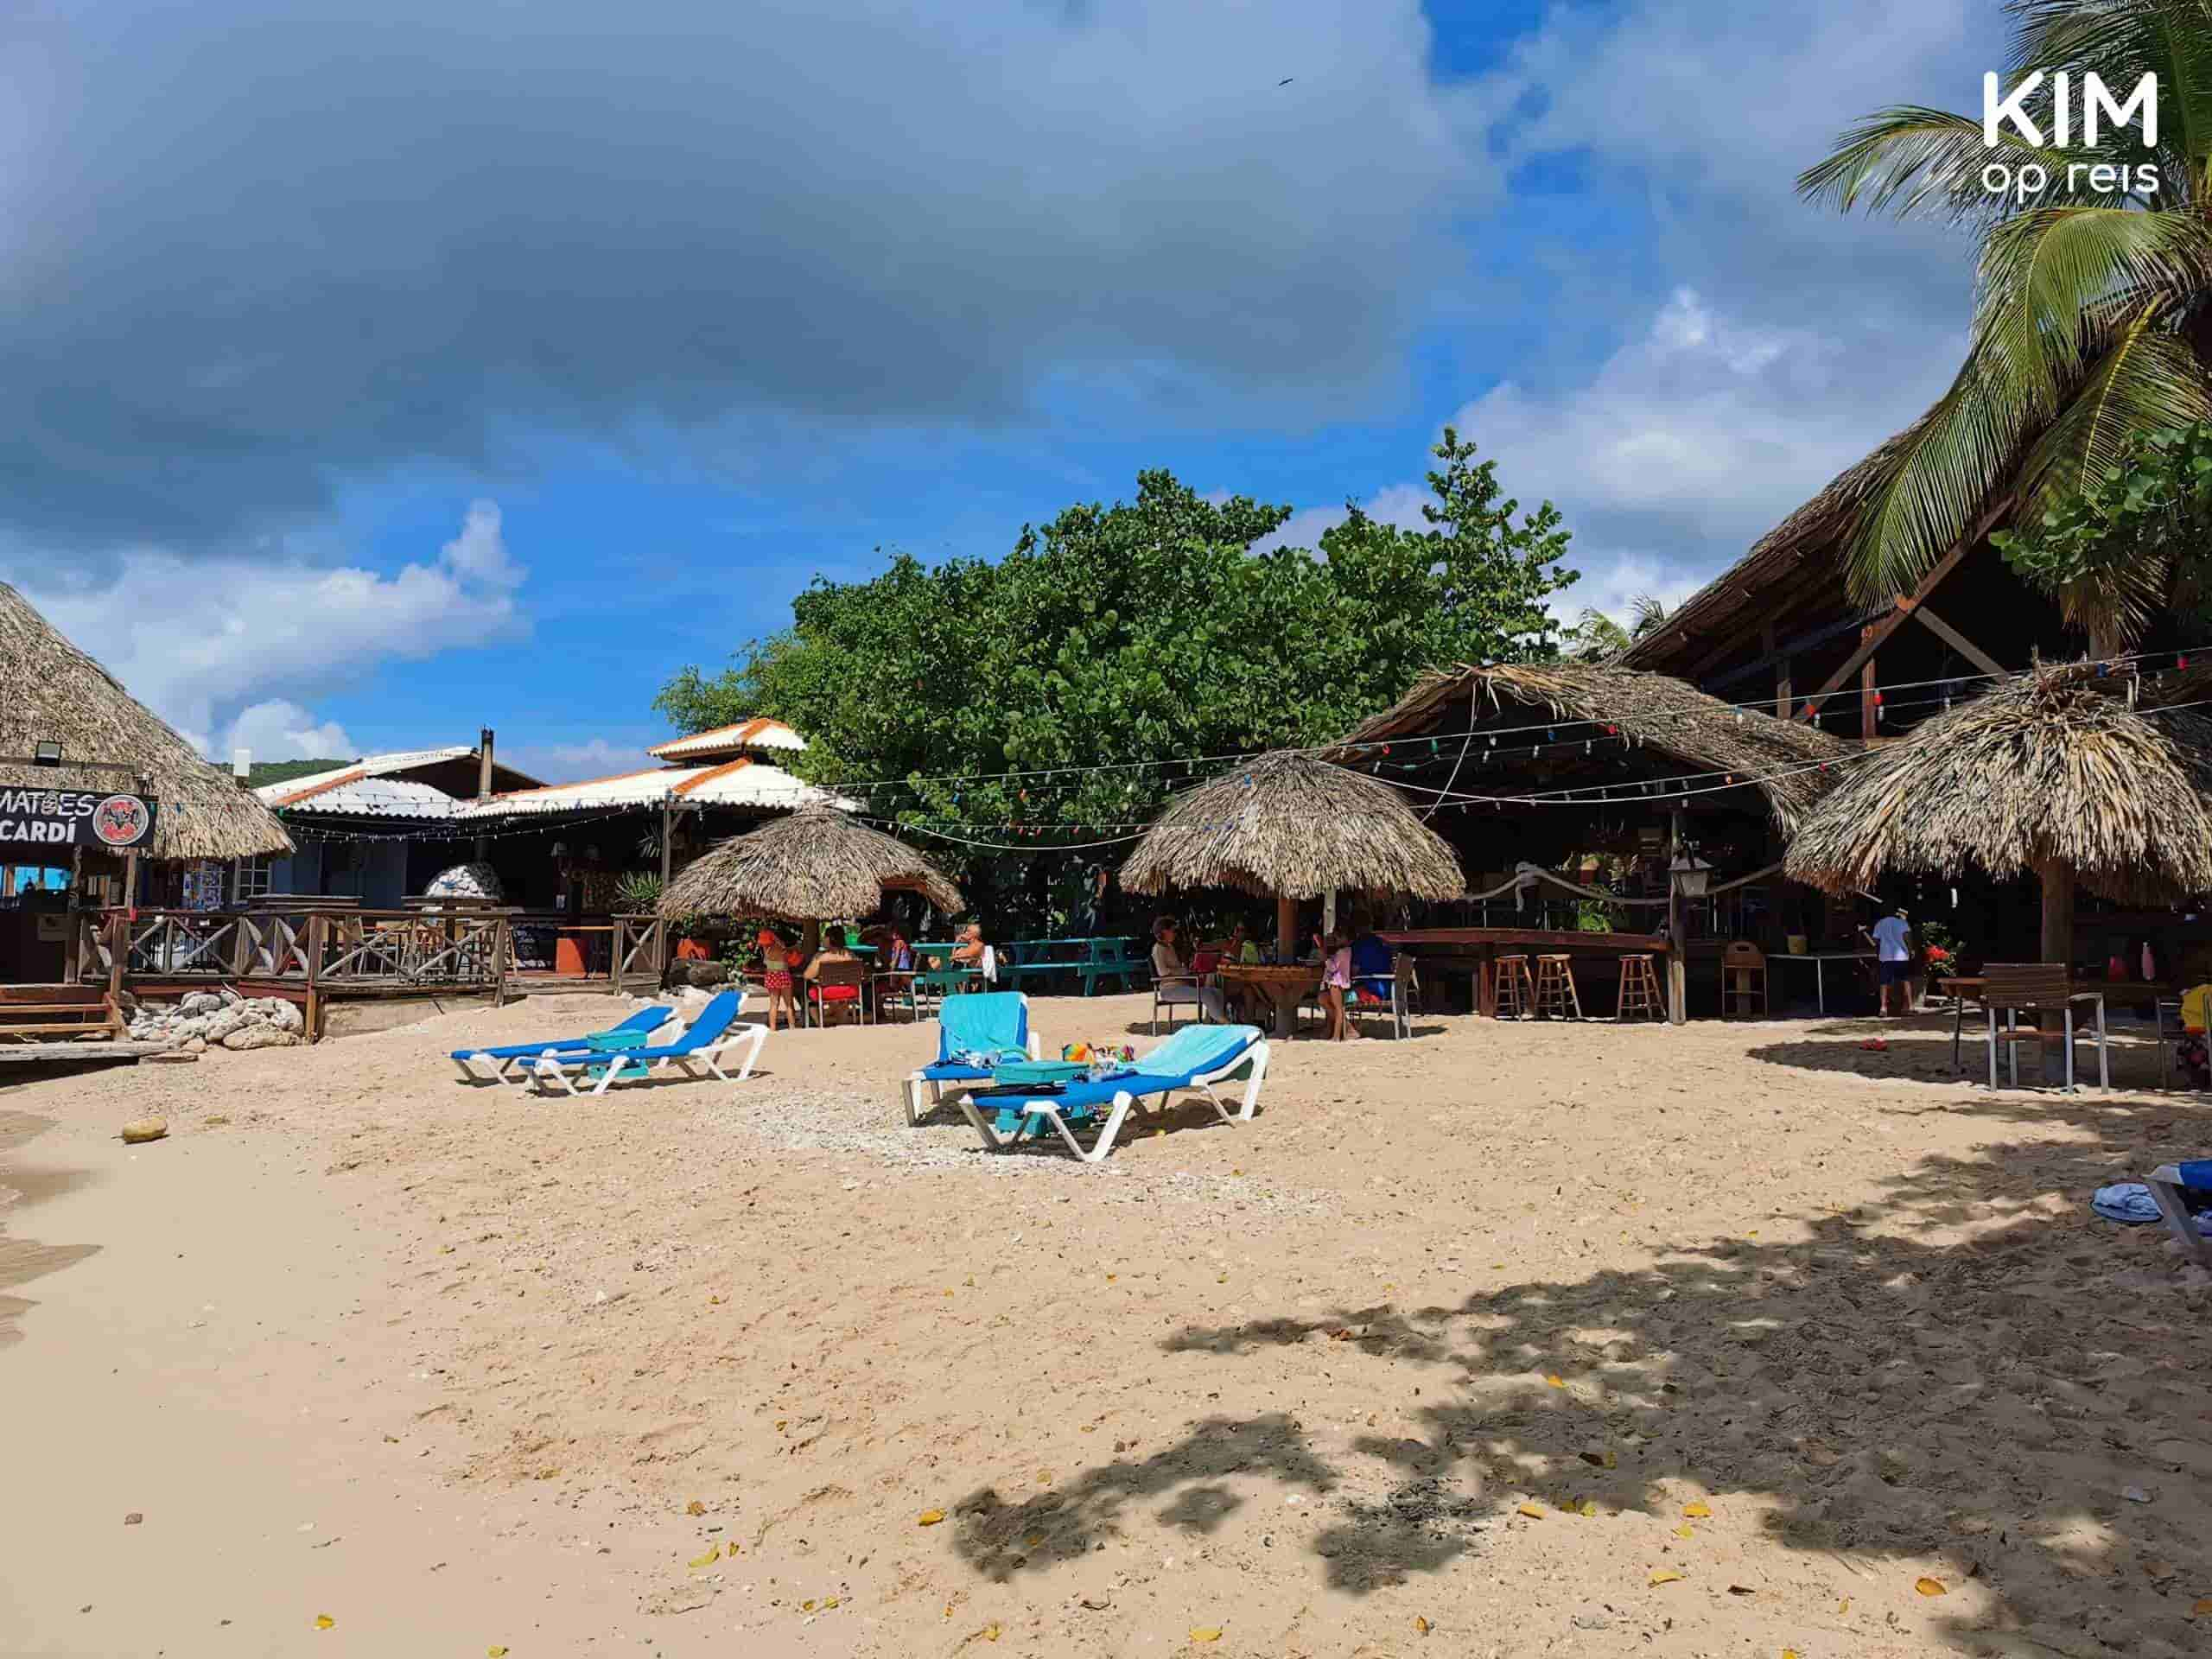 Playa Pescadera Curaçao: Pirate Bay beach house